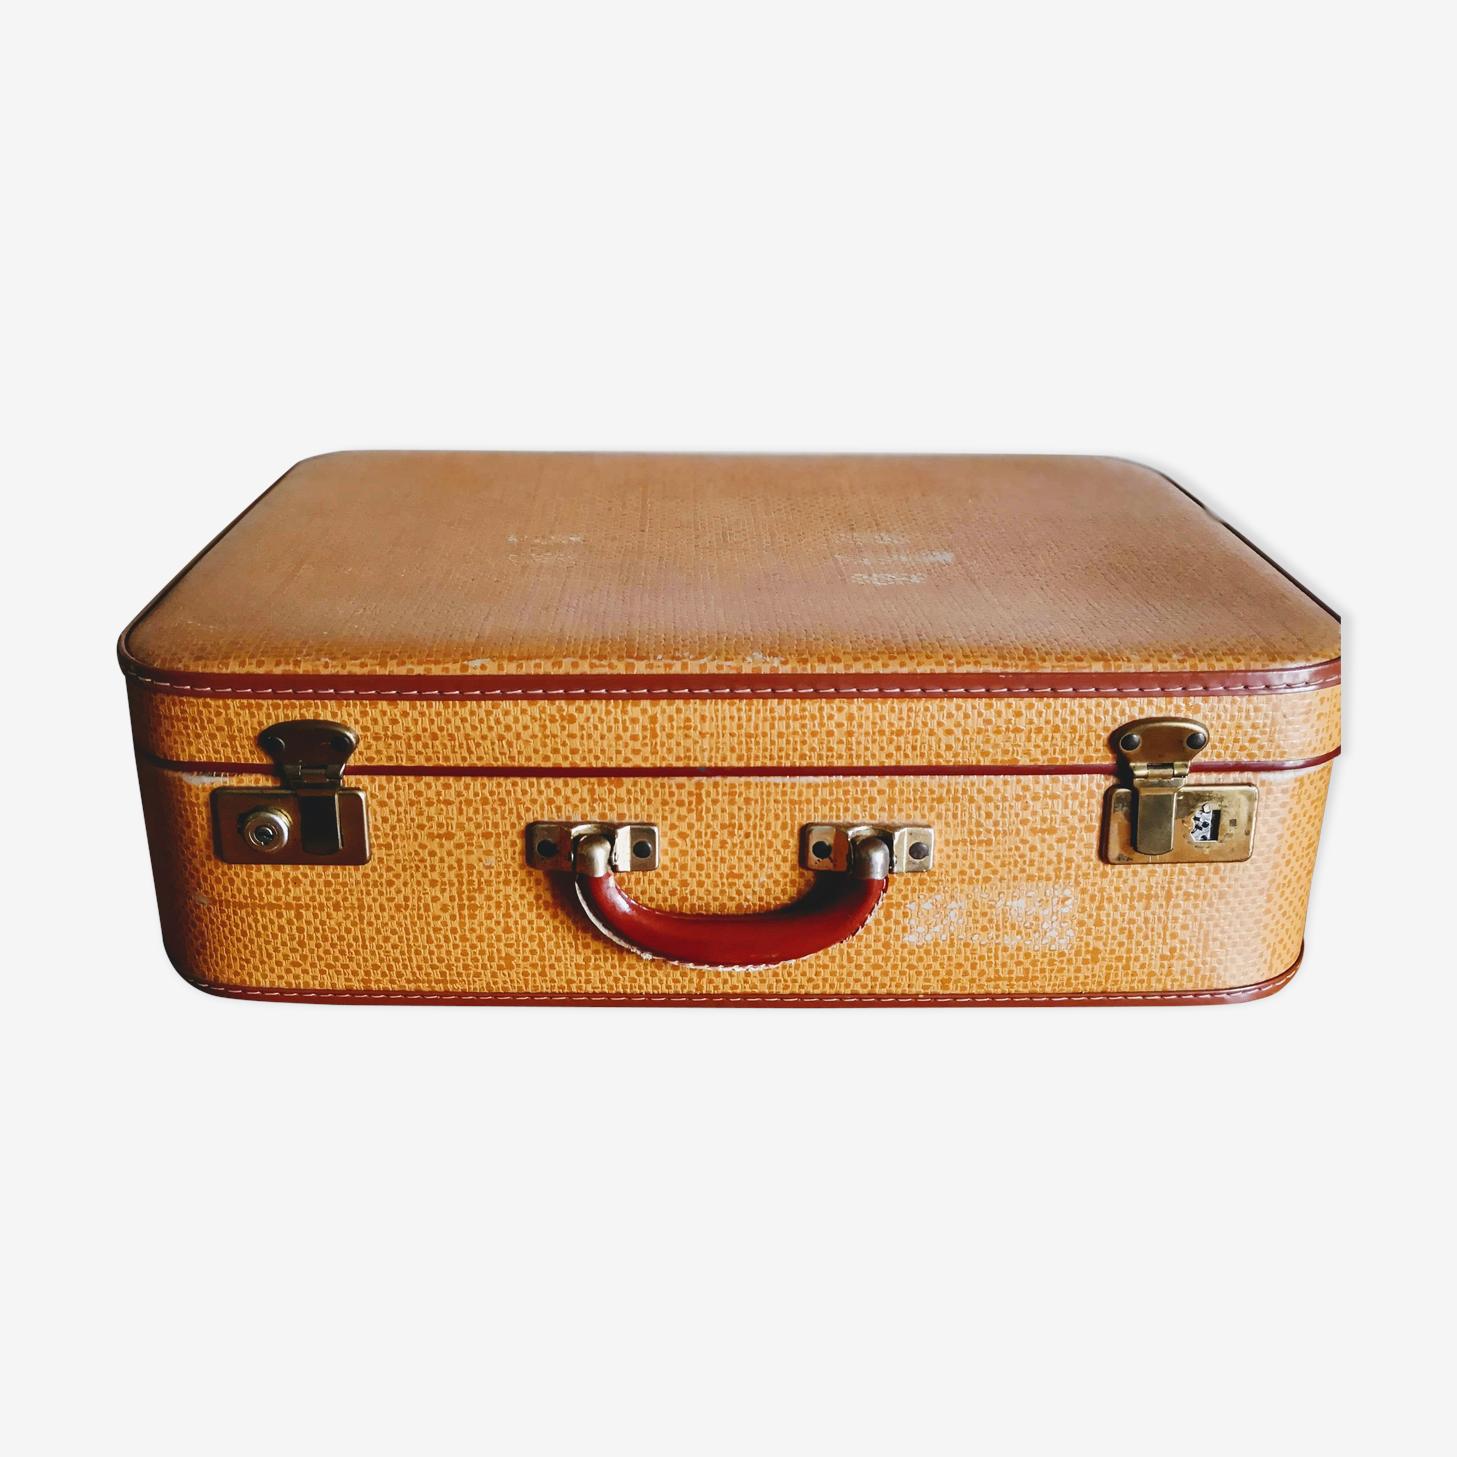 Ancienne valise jaune orangée